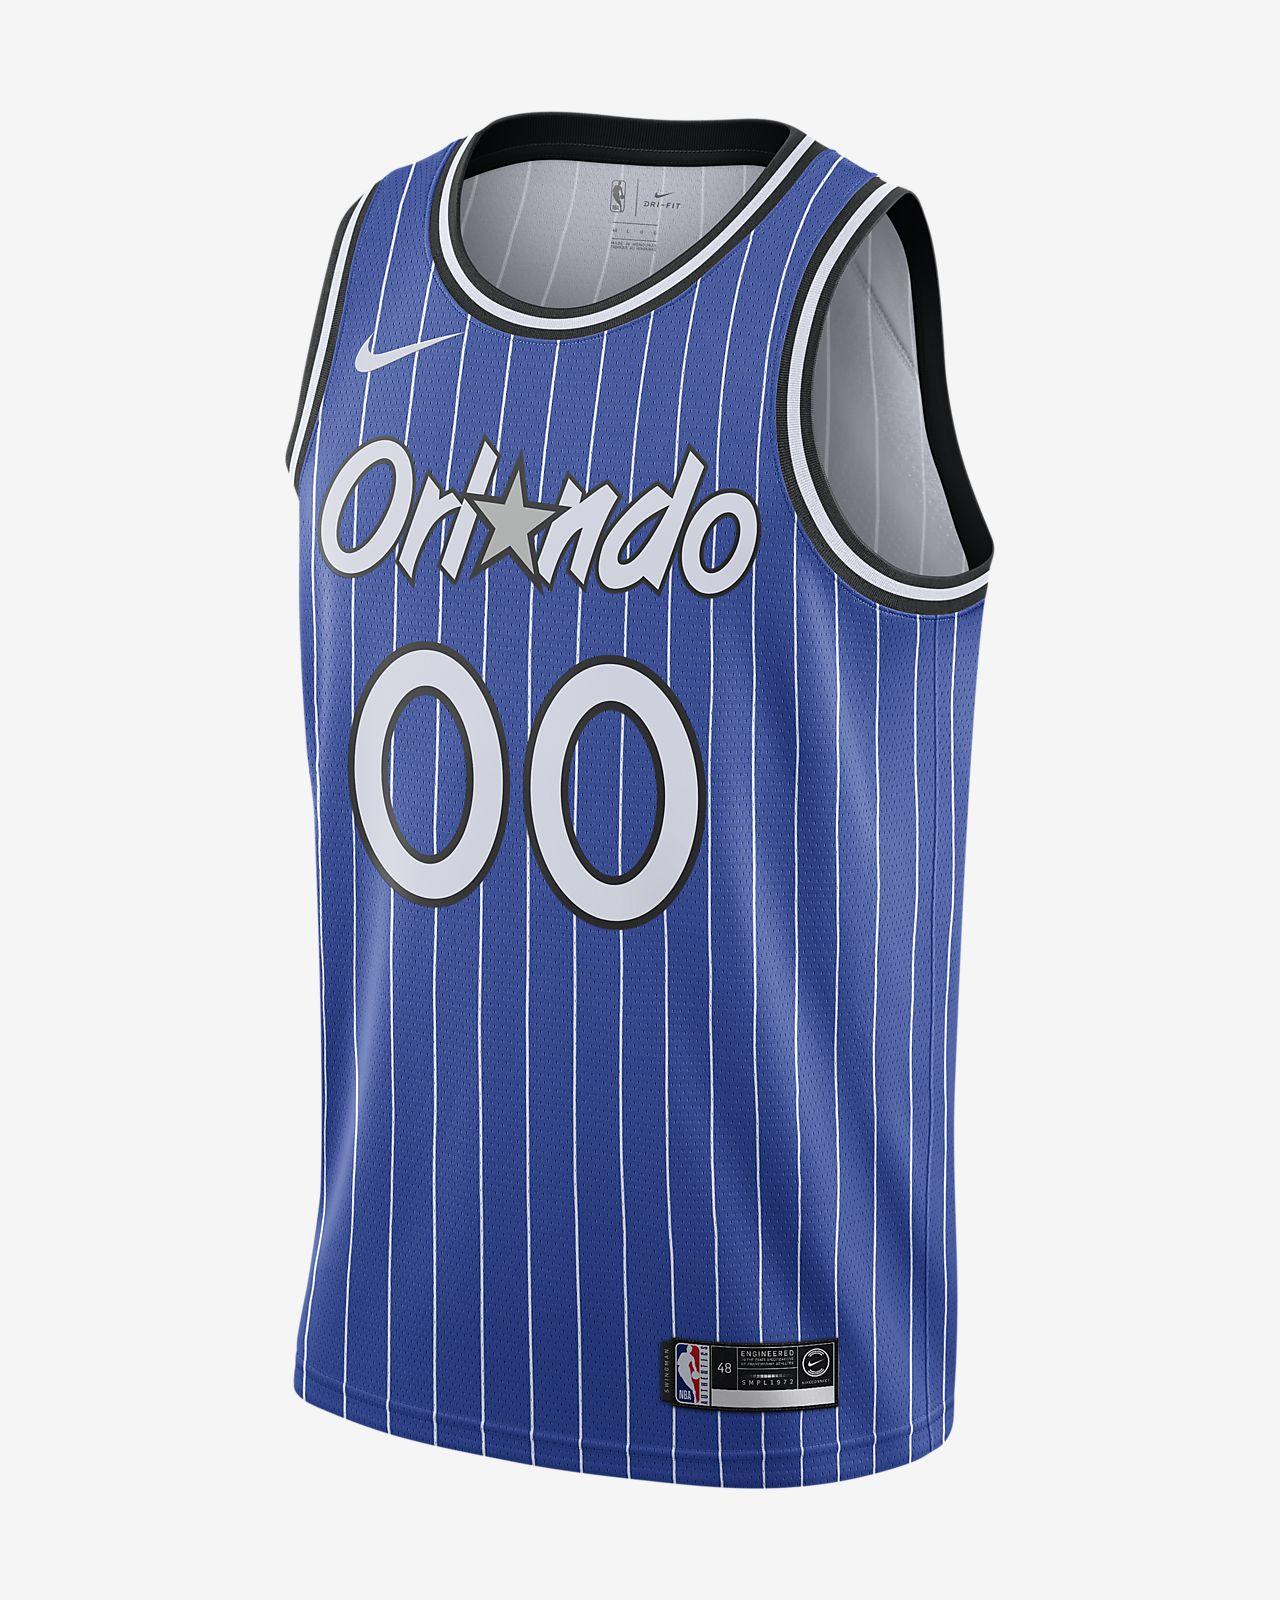 奥兰多魔术队 (Aaron Gordon) Classic Edition Swingman Nike NBA Connected Jersey 男子球衣